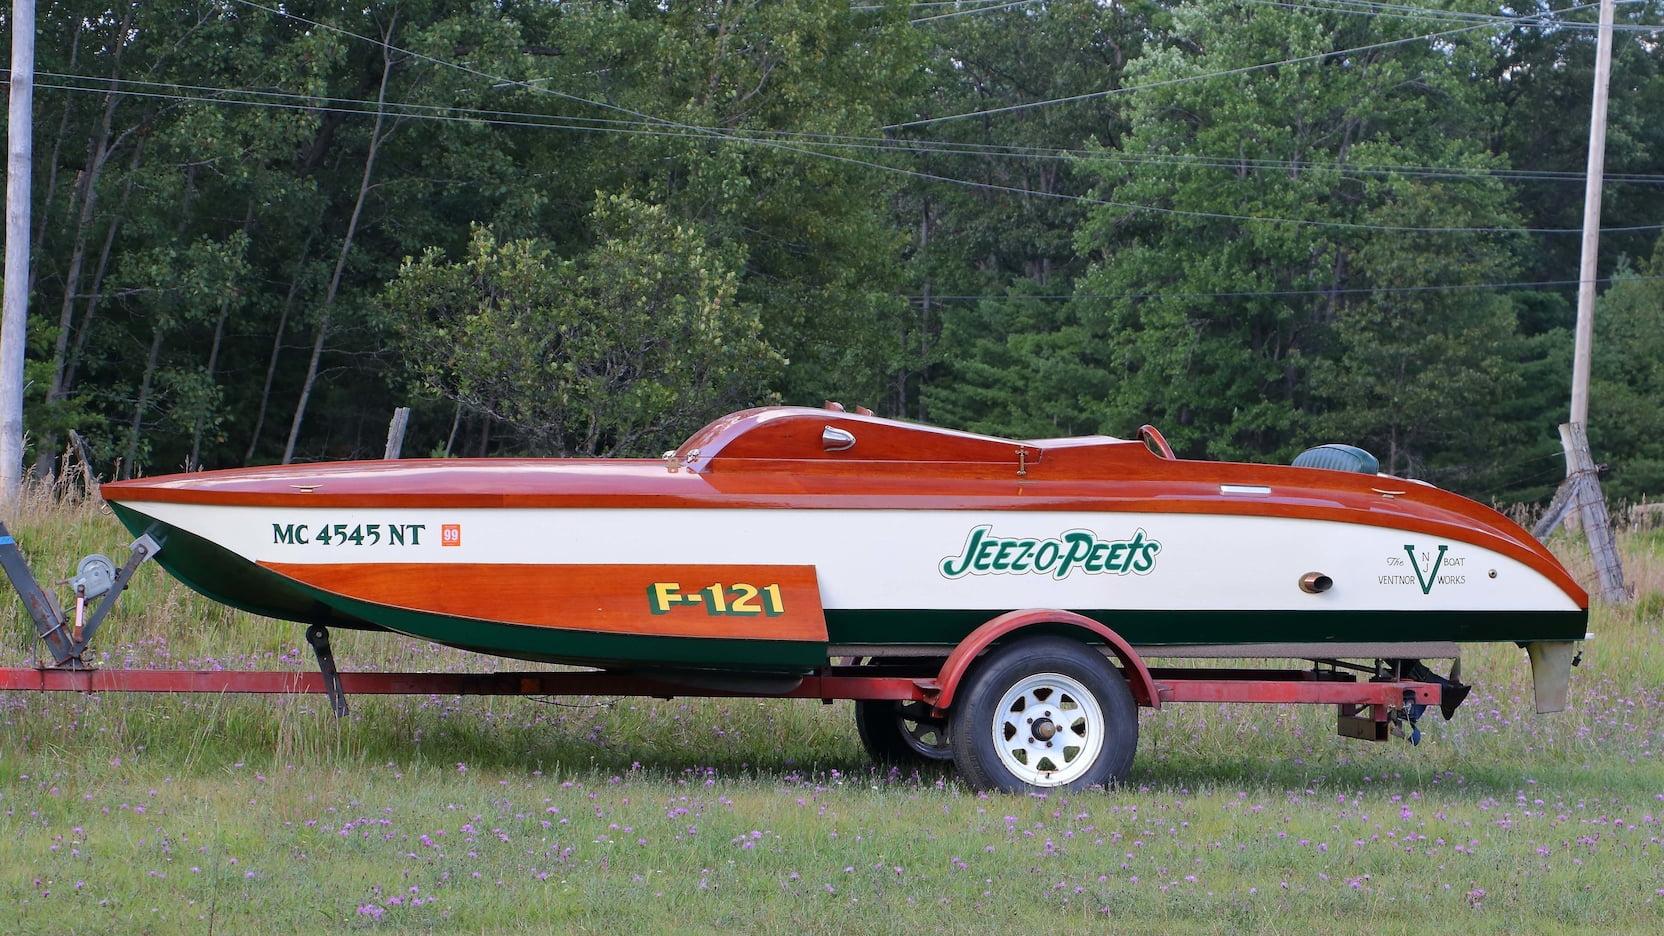 1937 Ventnor 18' Racing Runabout 'Jeez-O-Peets'